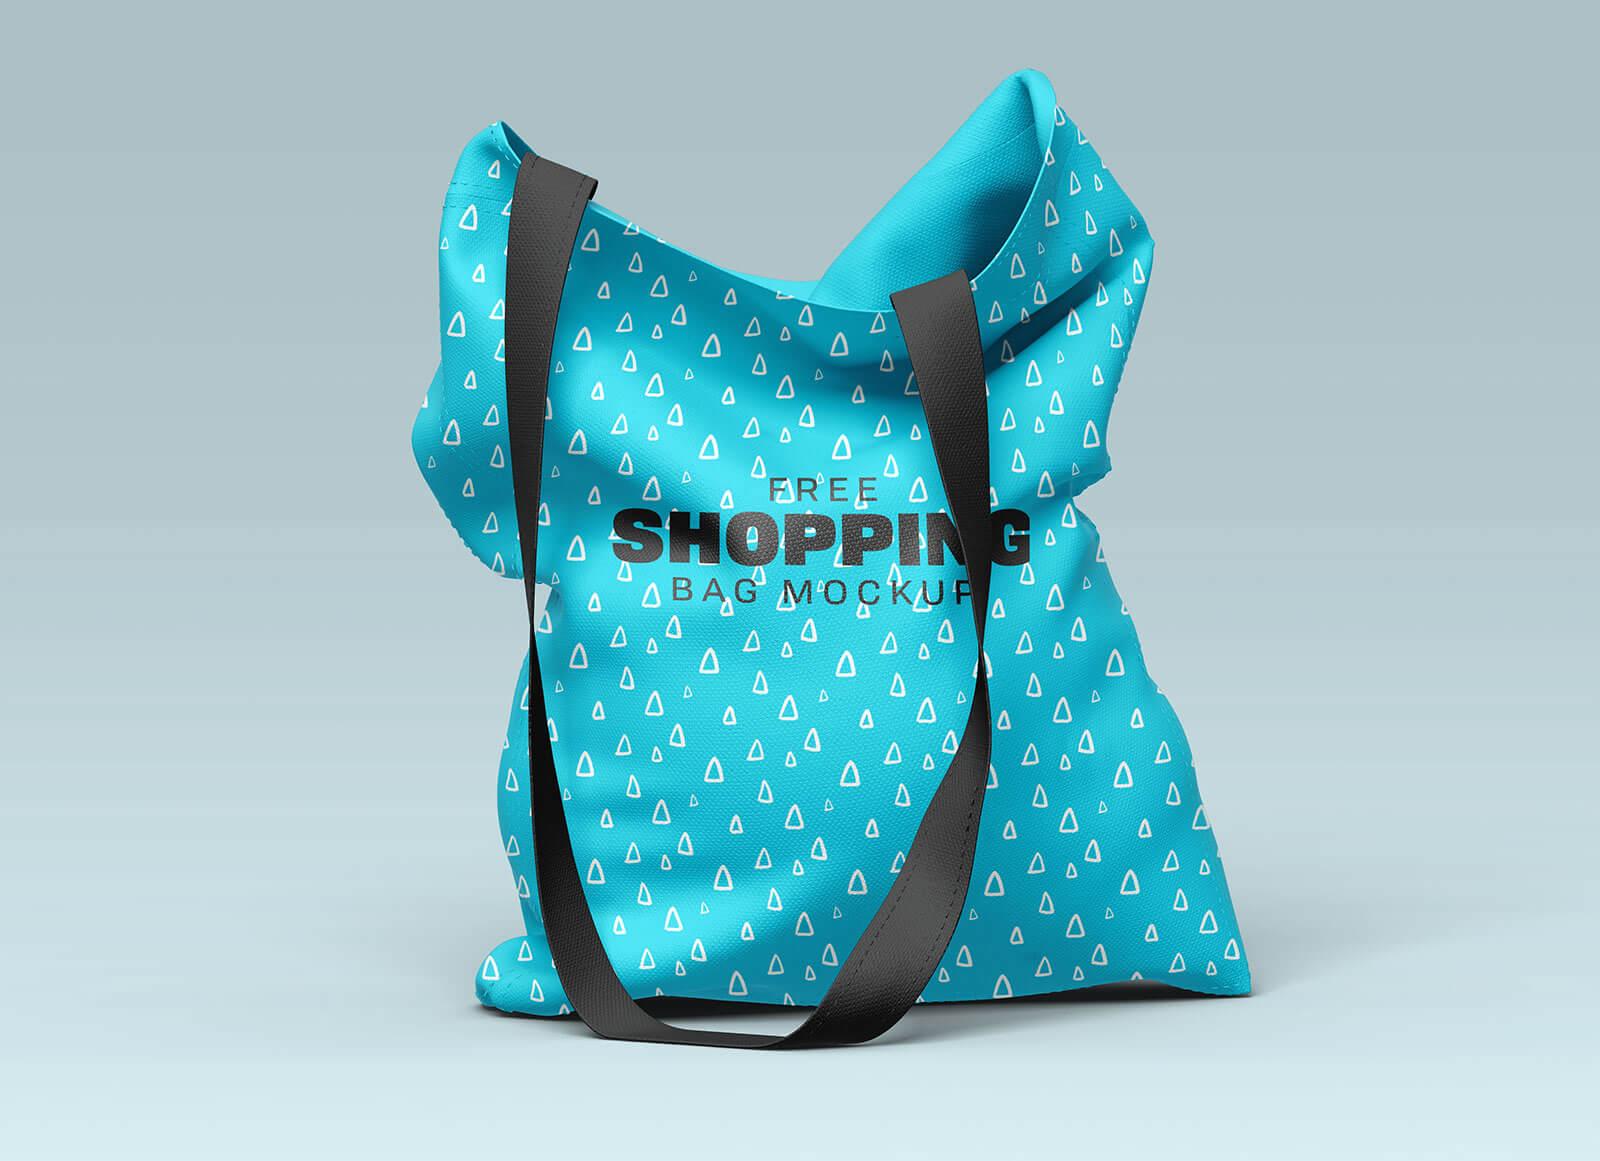 Free Eco-Friendly Shopping Bag Mockup Set (1)